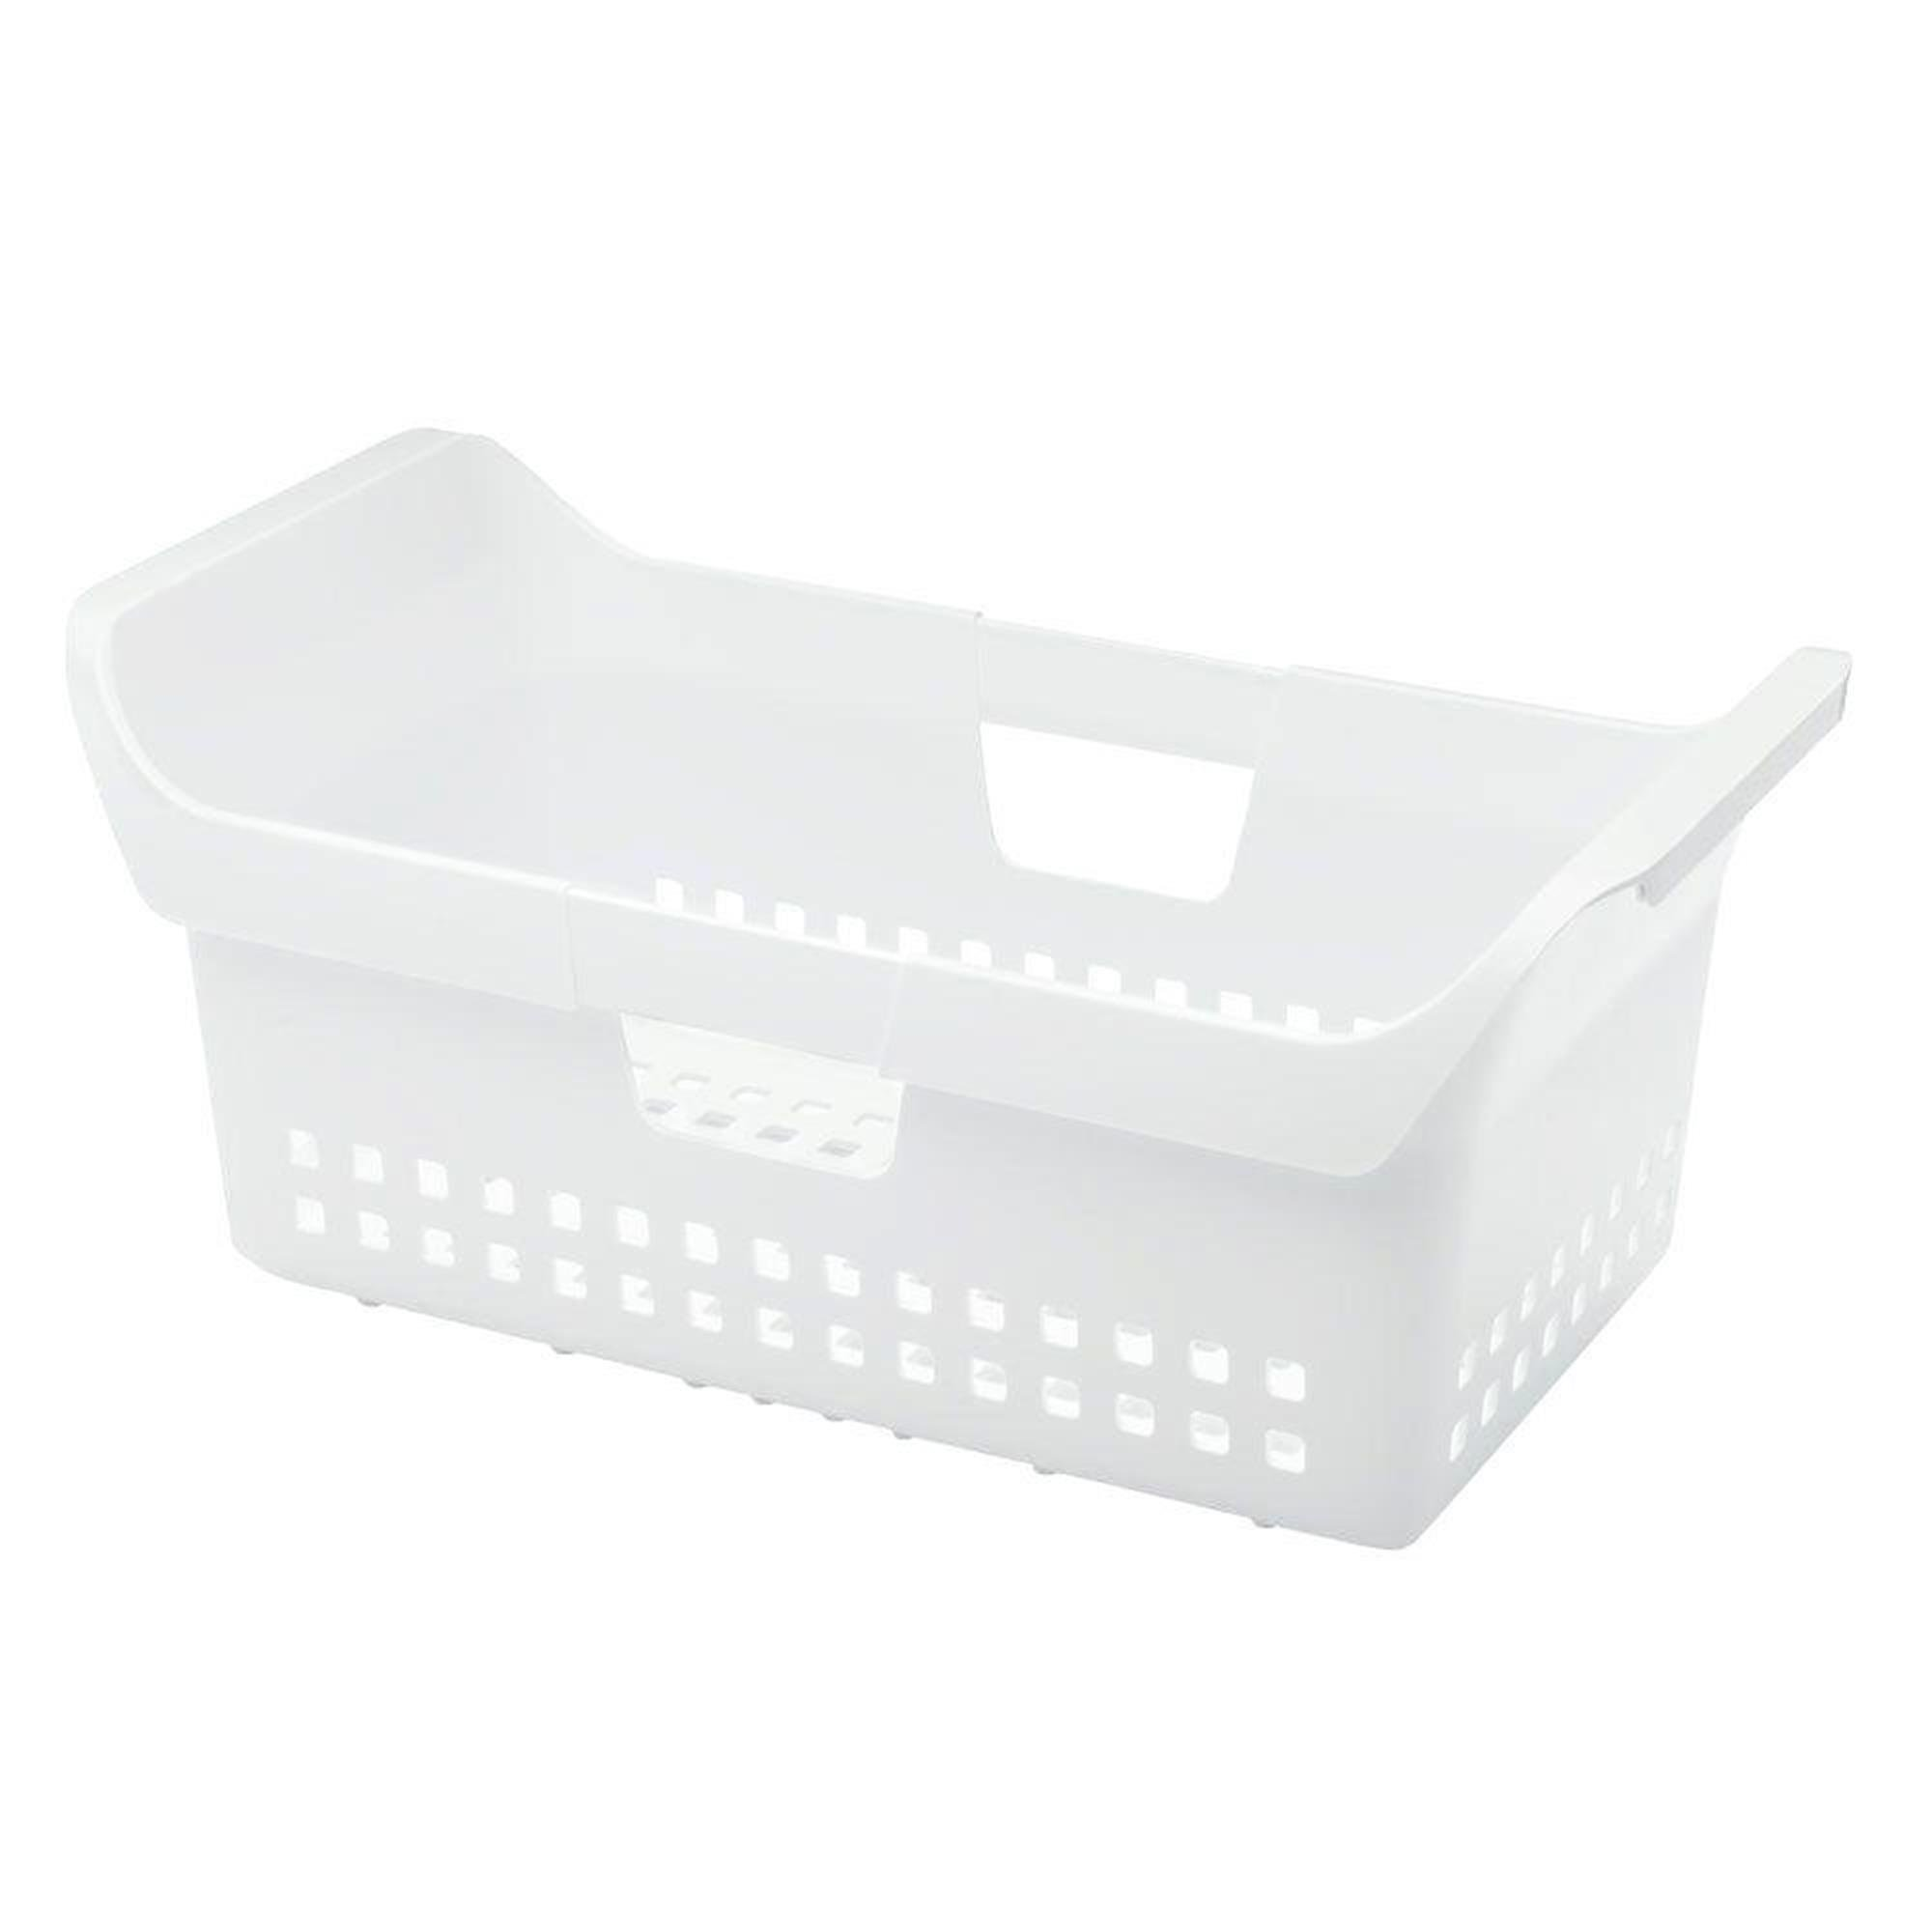 Frig Prts & Acc SpaceWise Shallow Freezer Basket